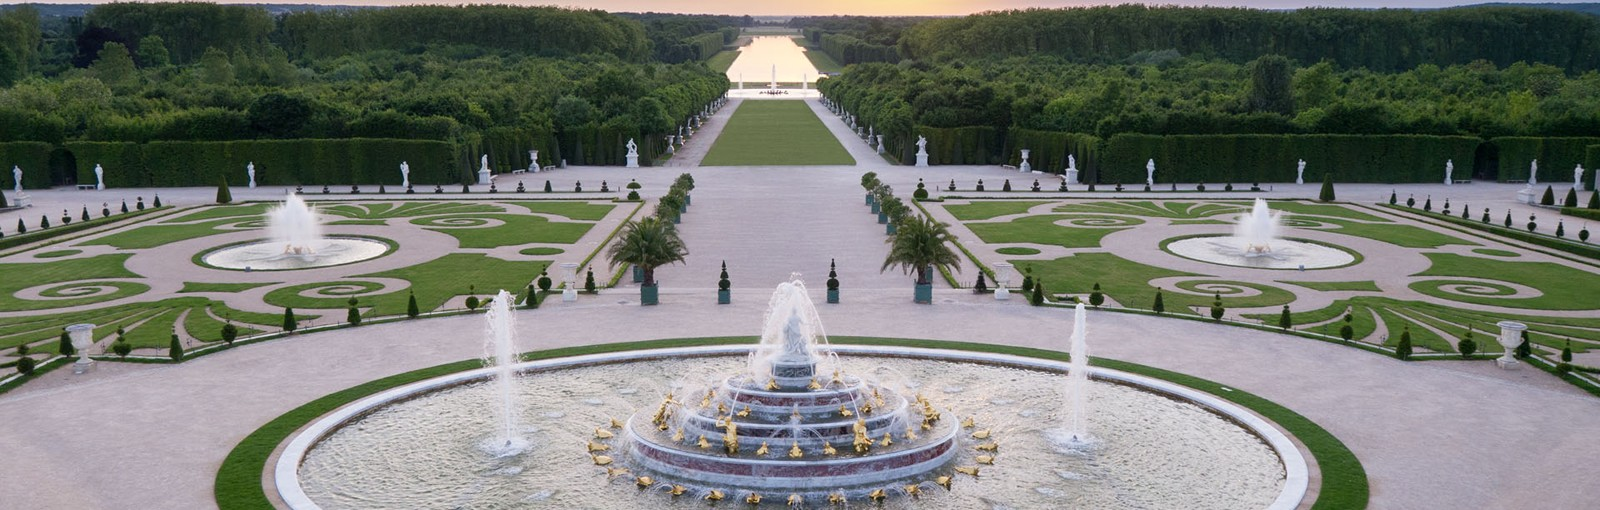 Tours 凡尔赛 - 半日游 - 从巴黎出发的一日游